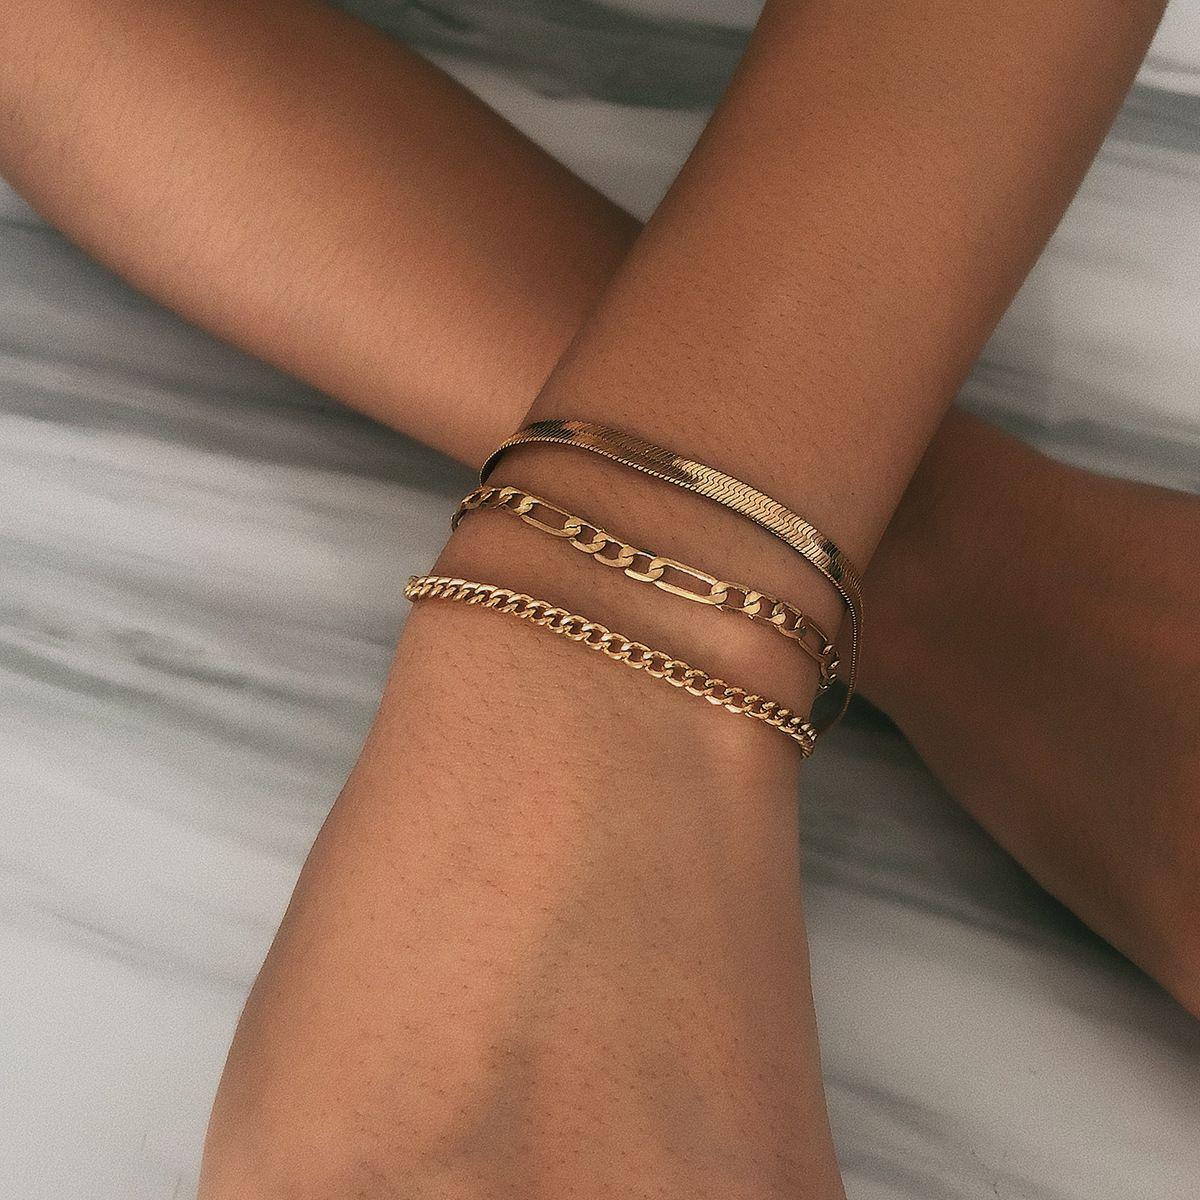 O ouro de prata empilhamento empilham o encanto pulseira pulseira multicamada pulseiras mulheres pulseira punho moda jóias e presente de areia